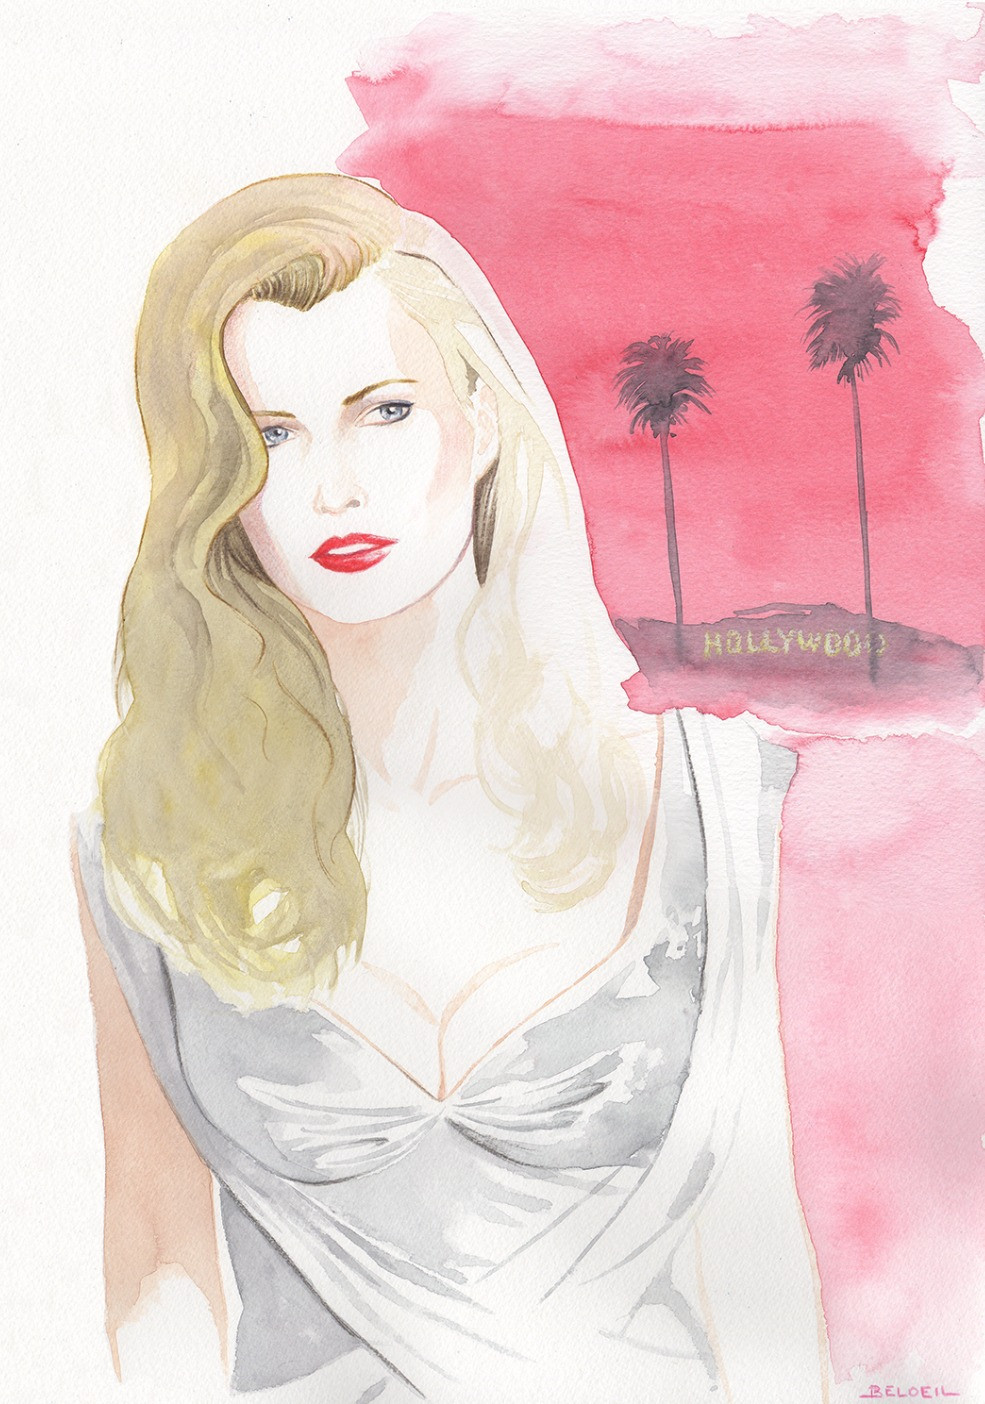 Kim Basinger - L.A. Confidential (1997) by Curtis Hanson. IIlustration ©GeoffreyBeloeil